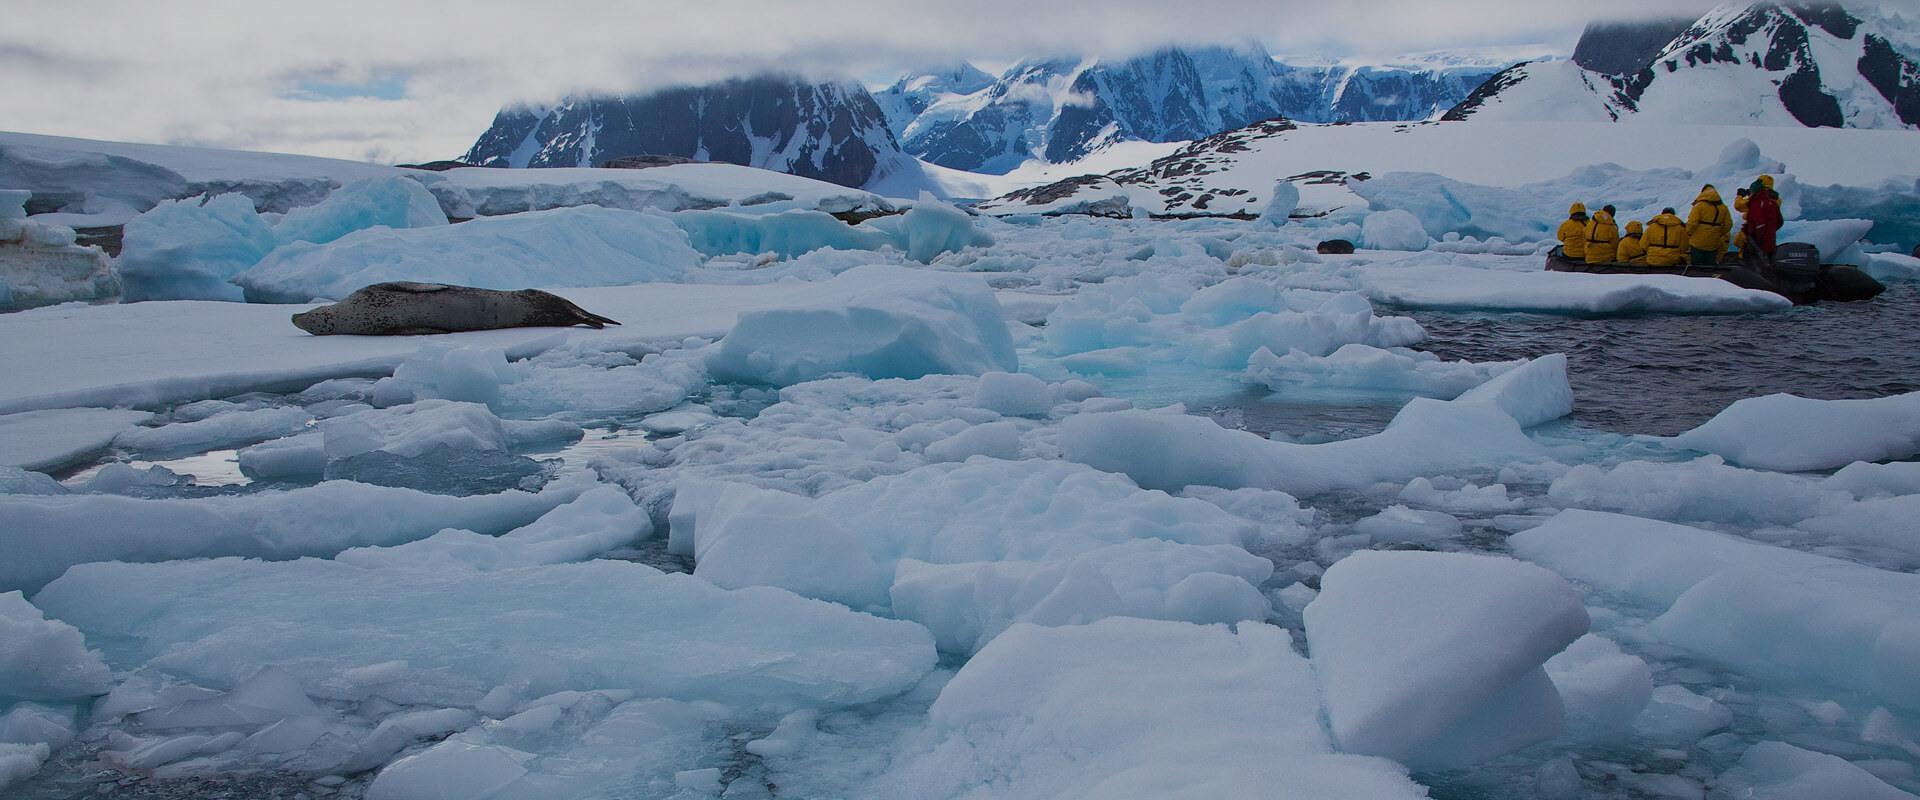 itinerary days argentina antarctic peninsula expedition